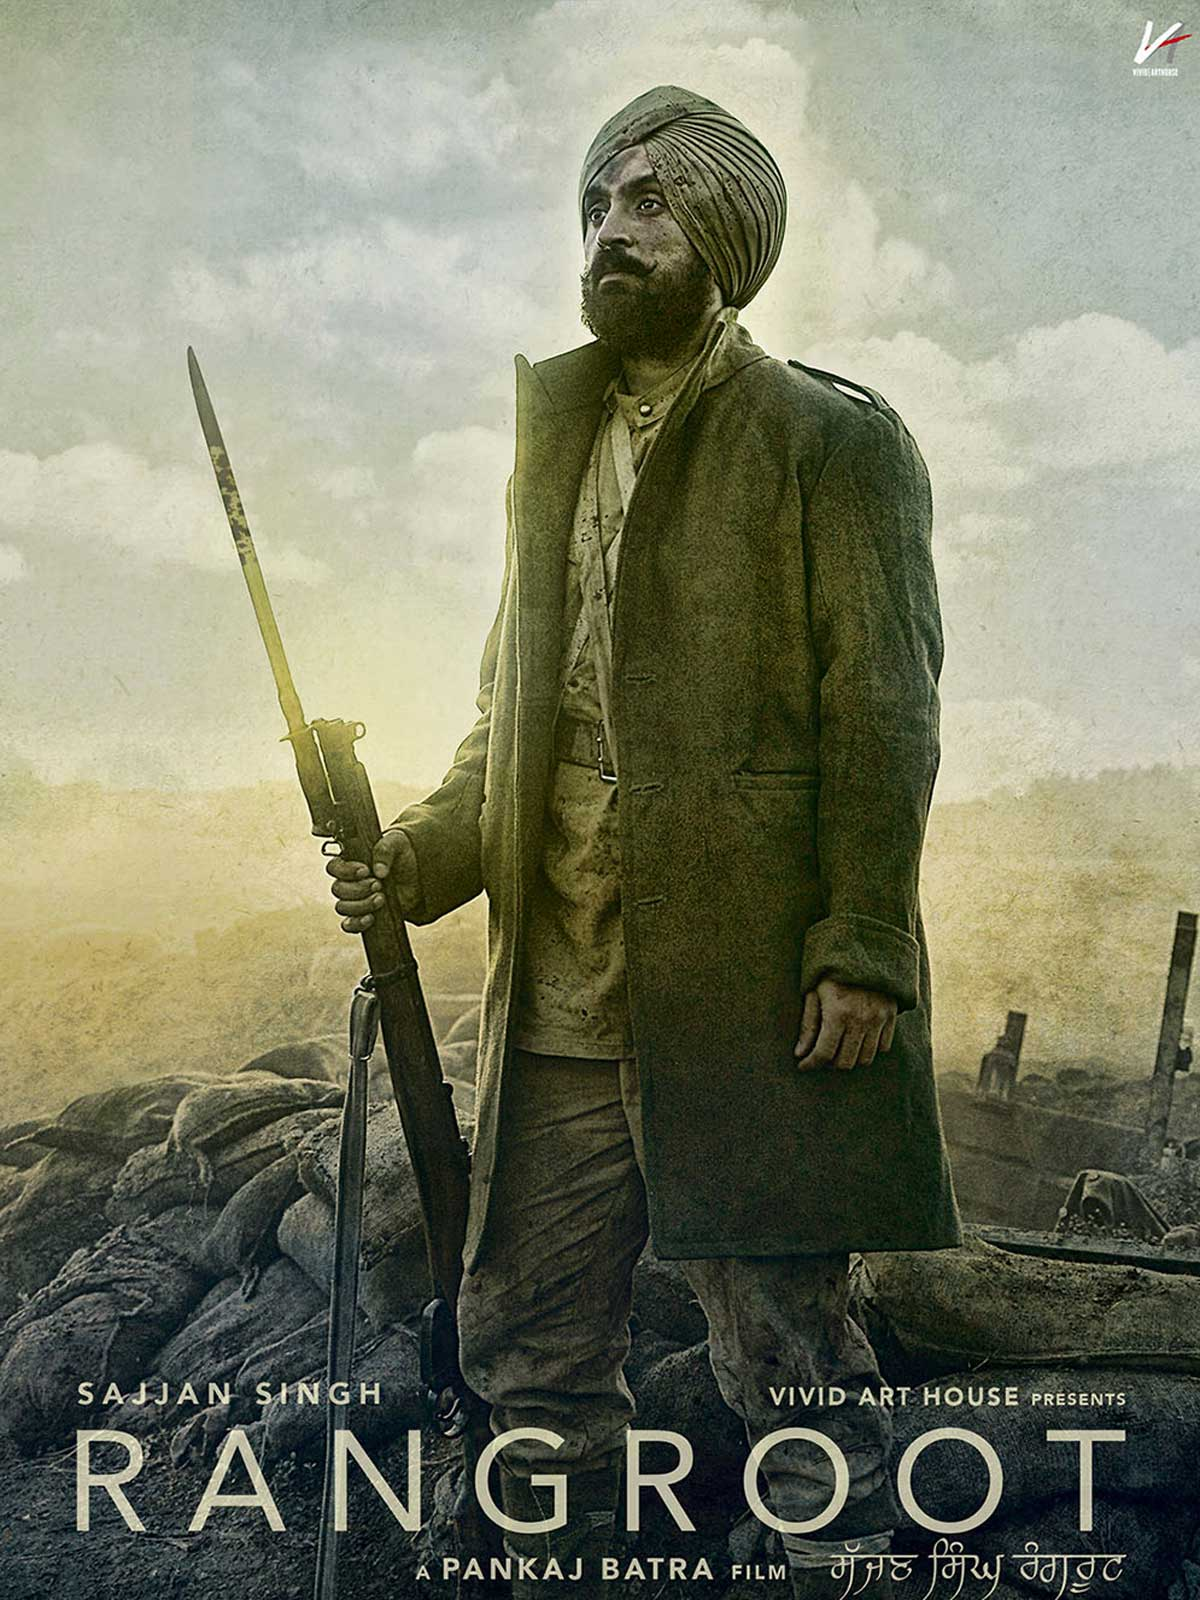 Sajan Singh Rangroot